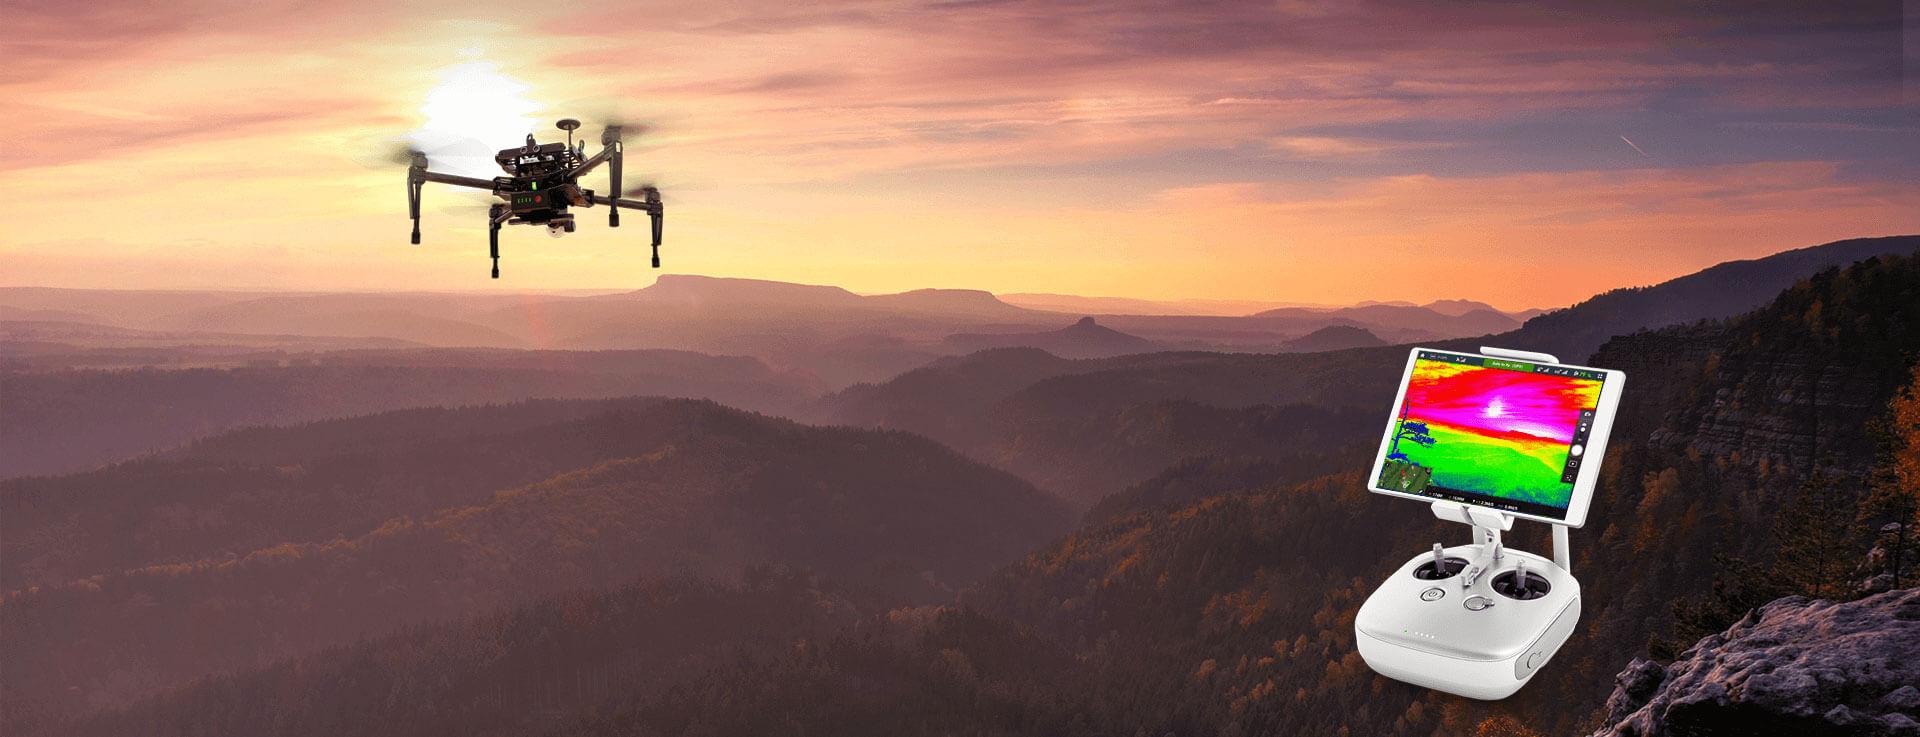 MMC Military drone